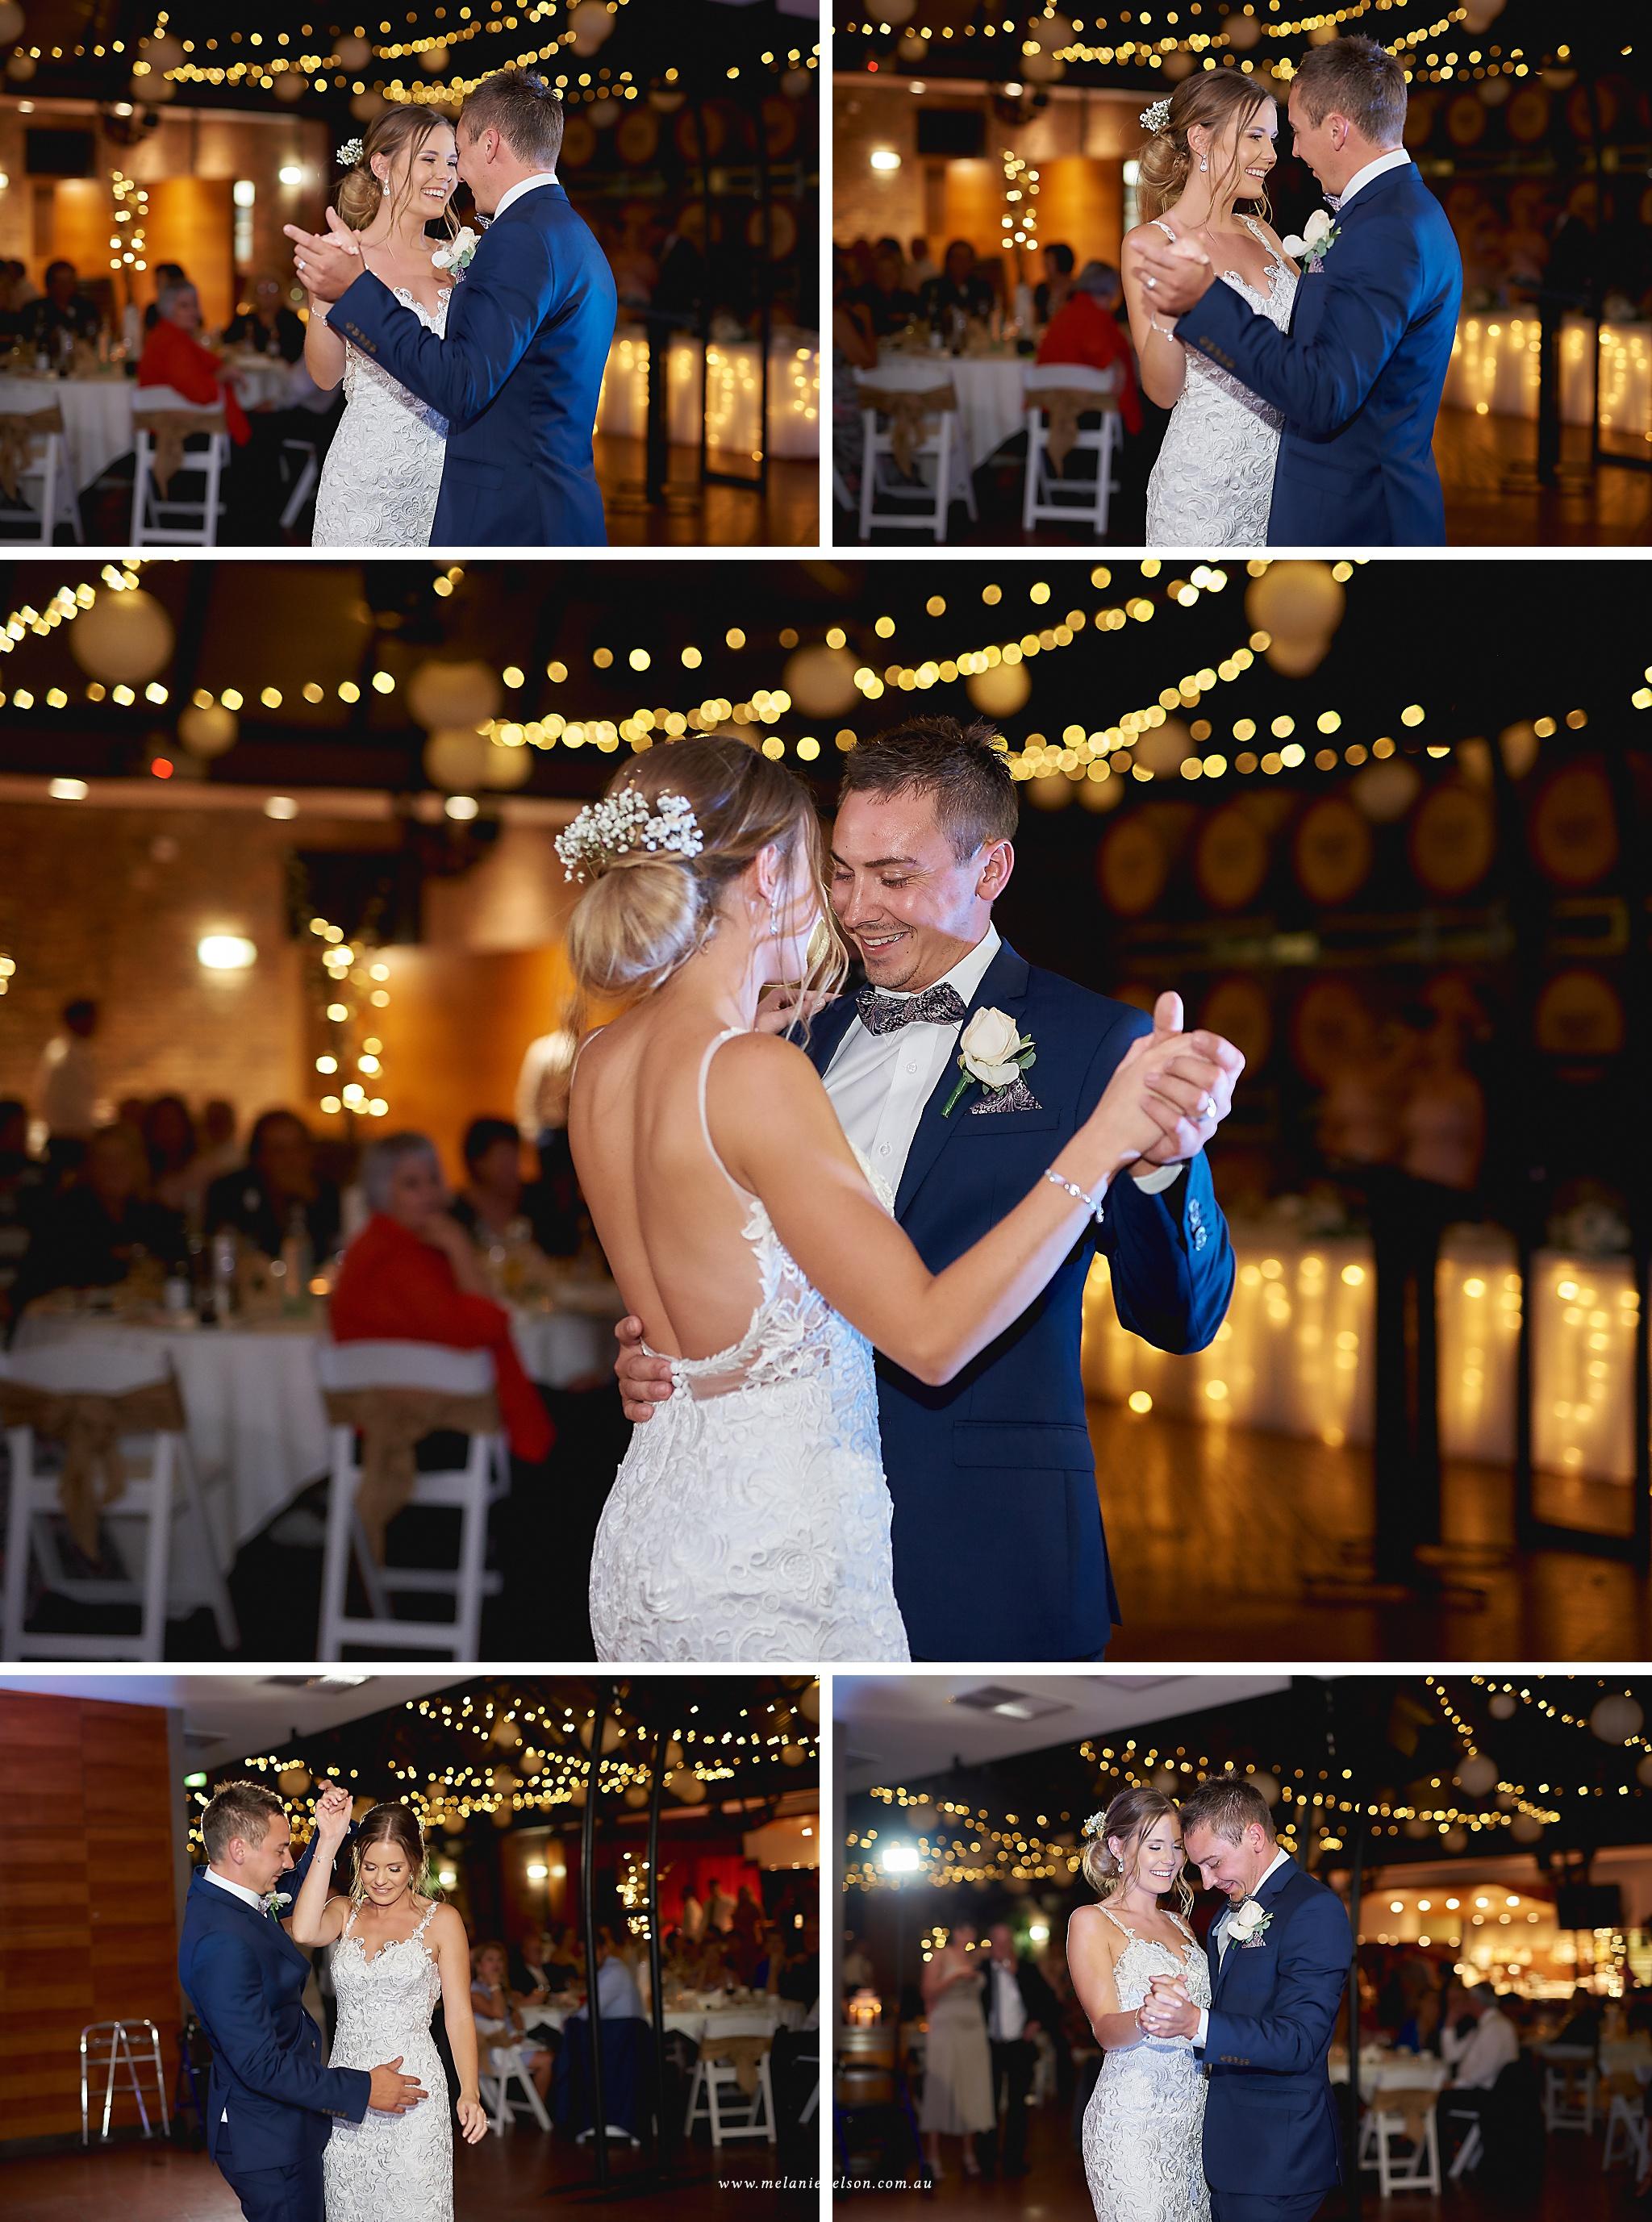 serafino_wedding_photography_0080.jpg